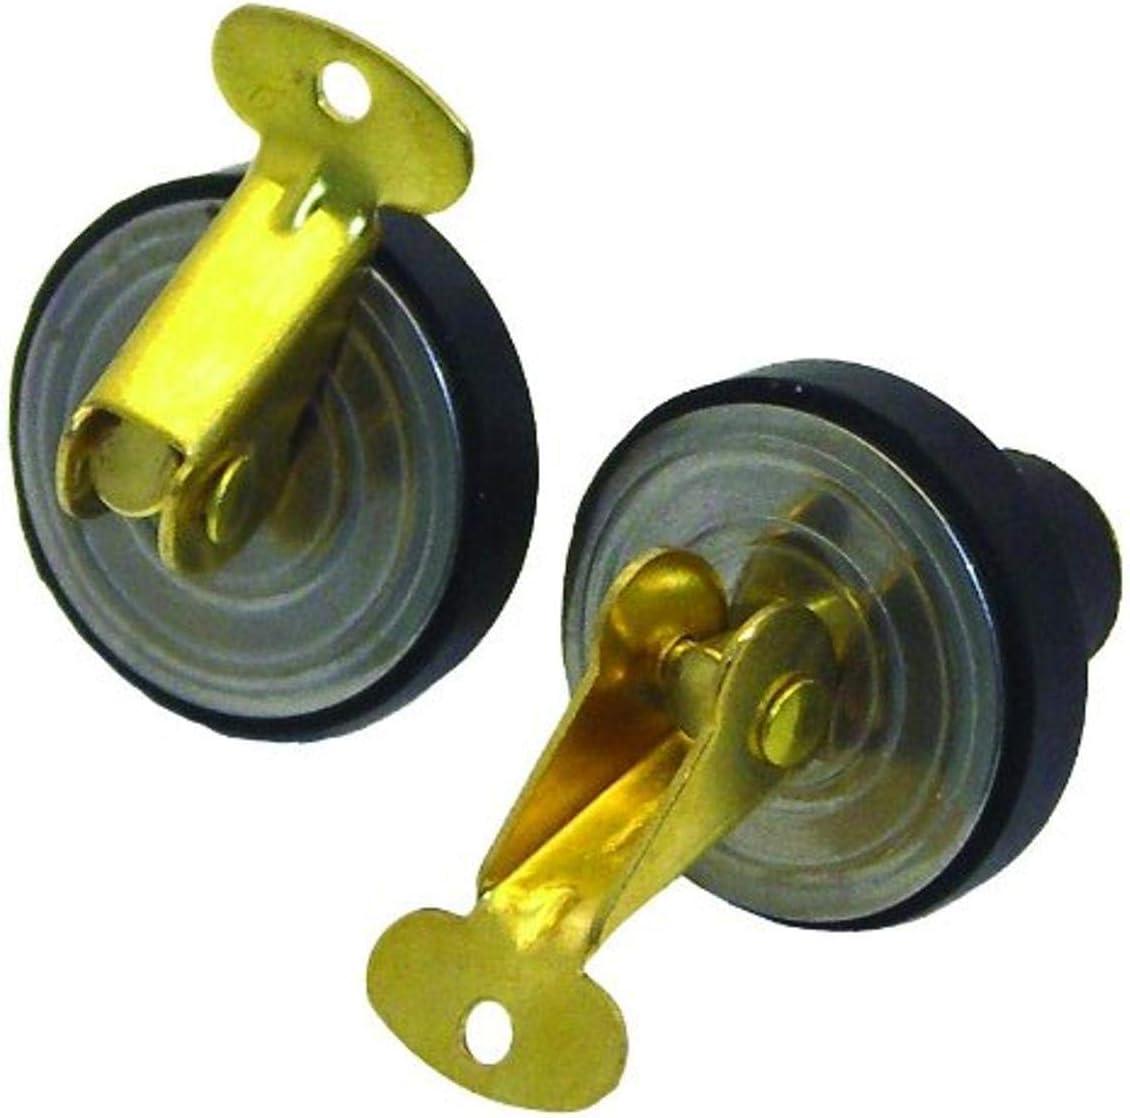 Invincible Marine BR54850Bailer/Baitwell Plug 1/2-Inch Brass PR